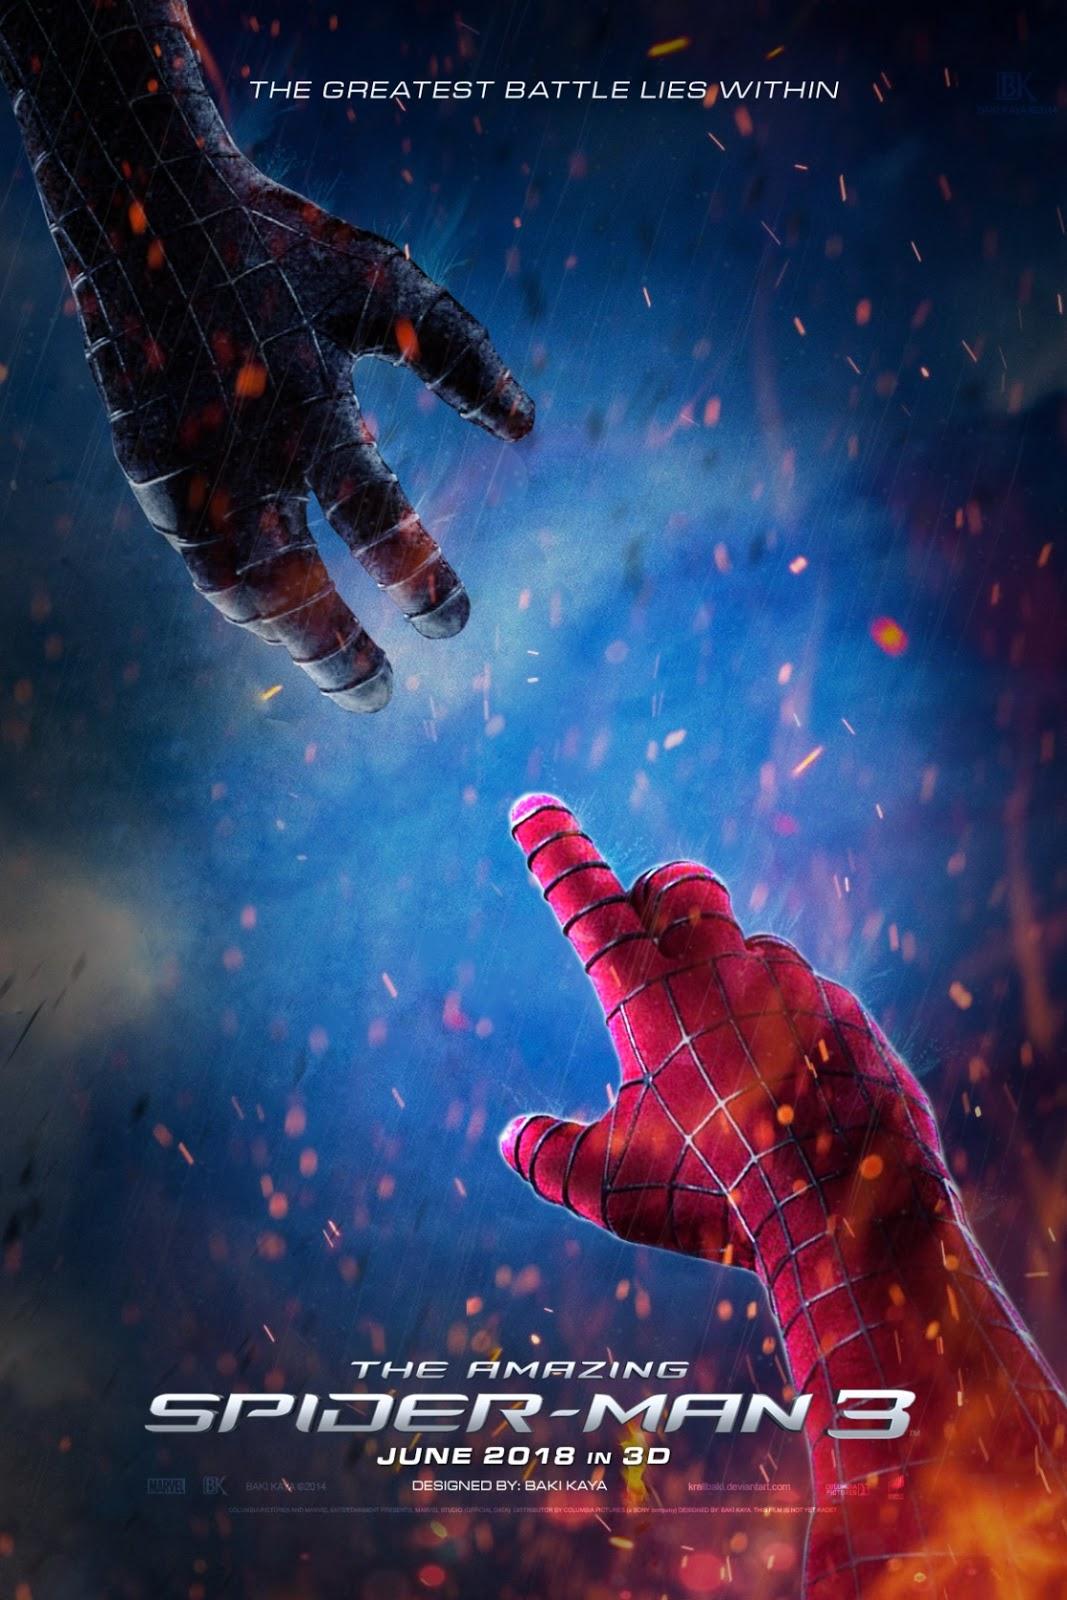 Untitled Spider-Man 3 Reboot (2017) ดิ อะเมซิ่ง สไปเดอร์แมน 3 [HD]